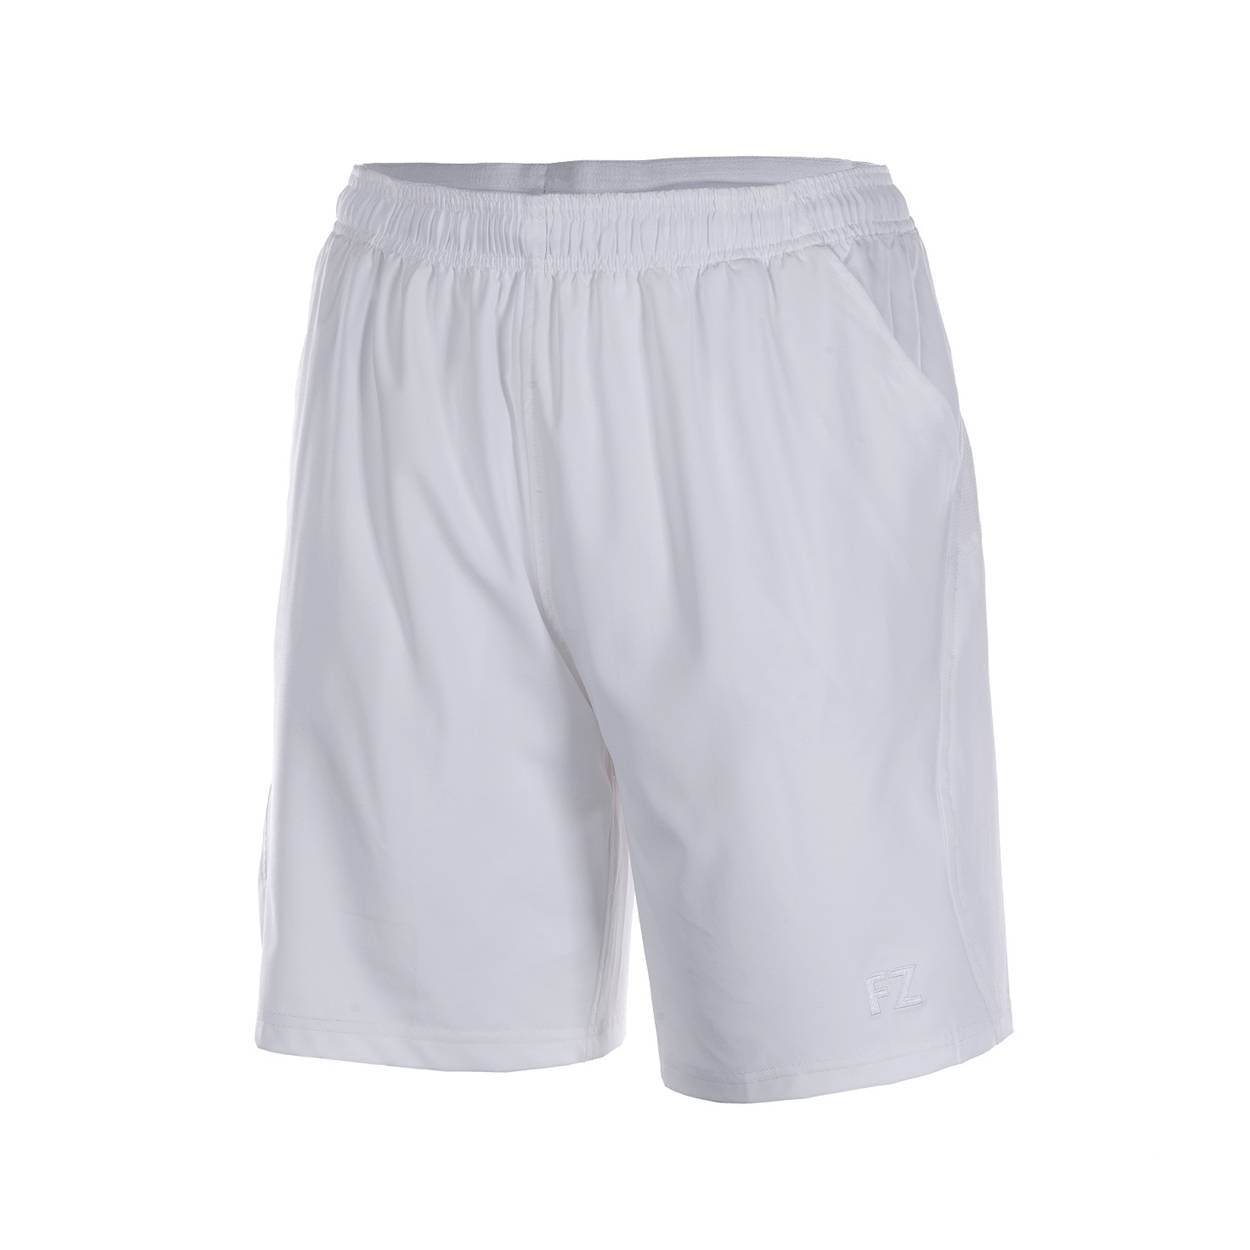 FZ Forza Ajax Shorts Men White XL